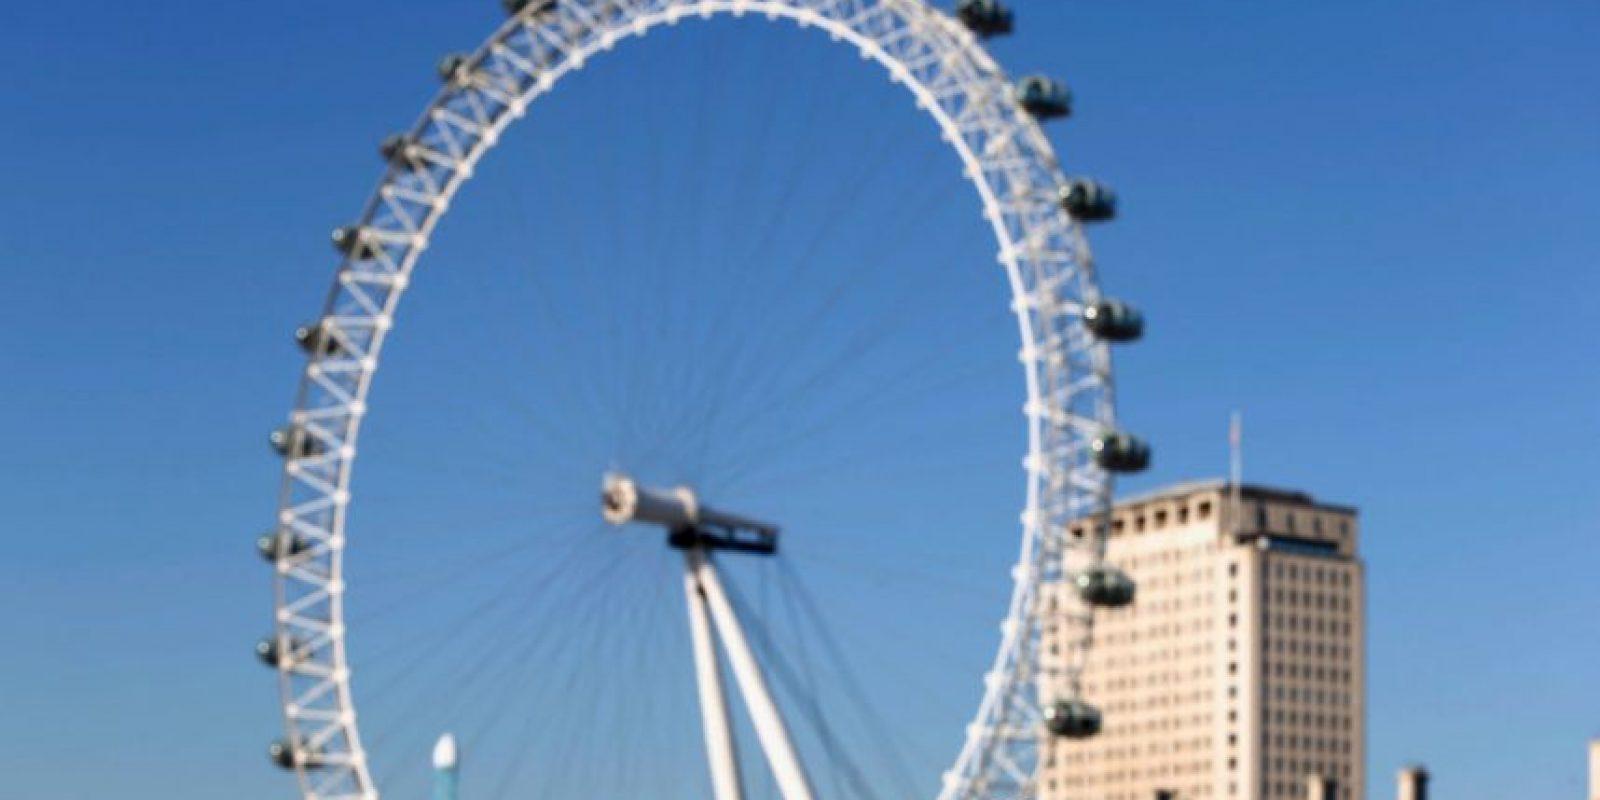 London Eye Foto:Getty Images